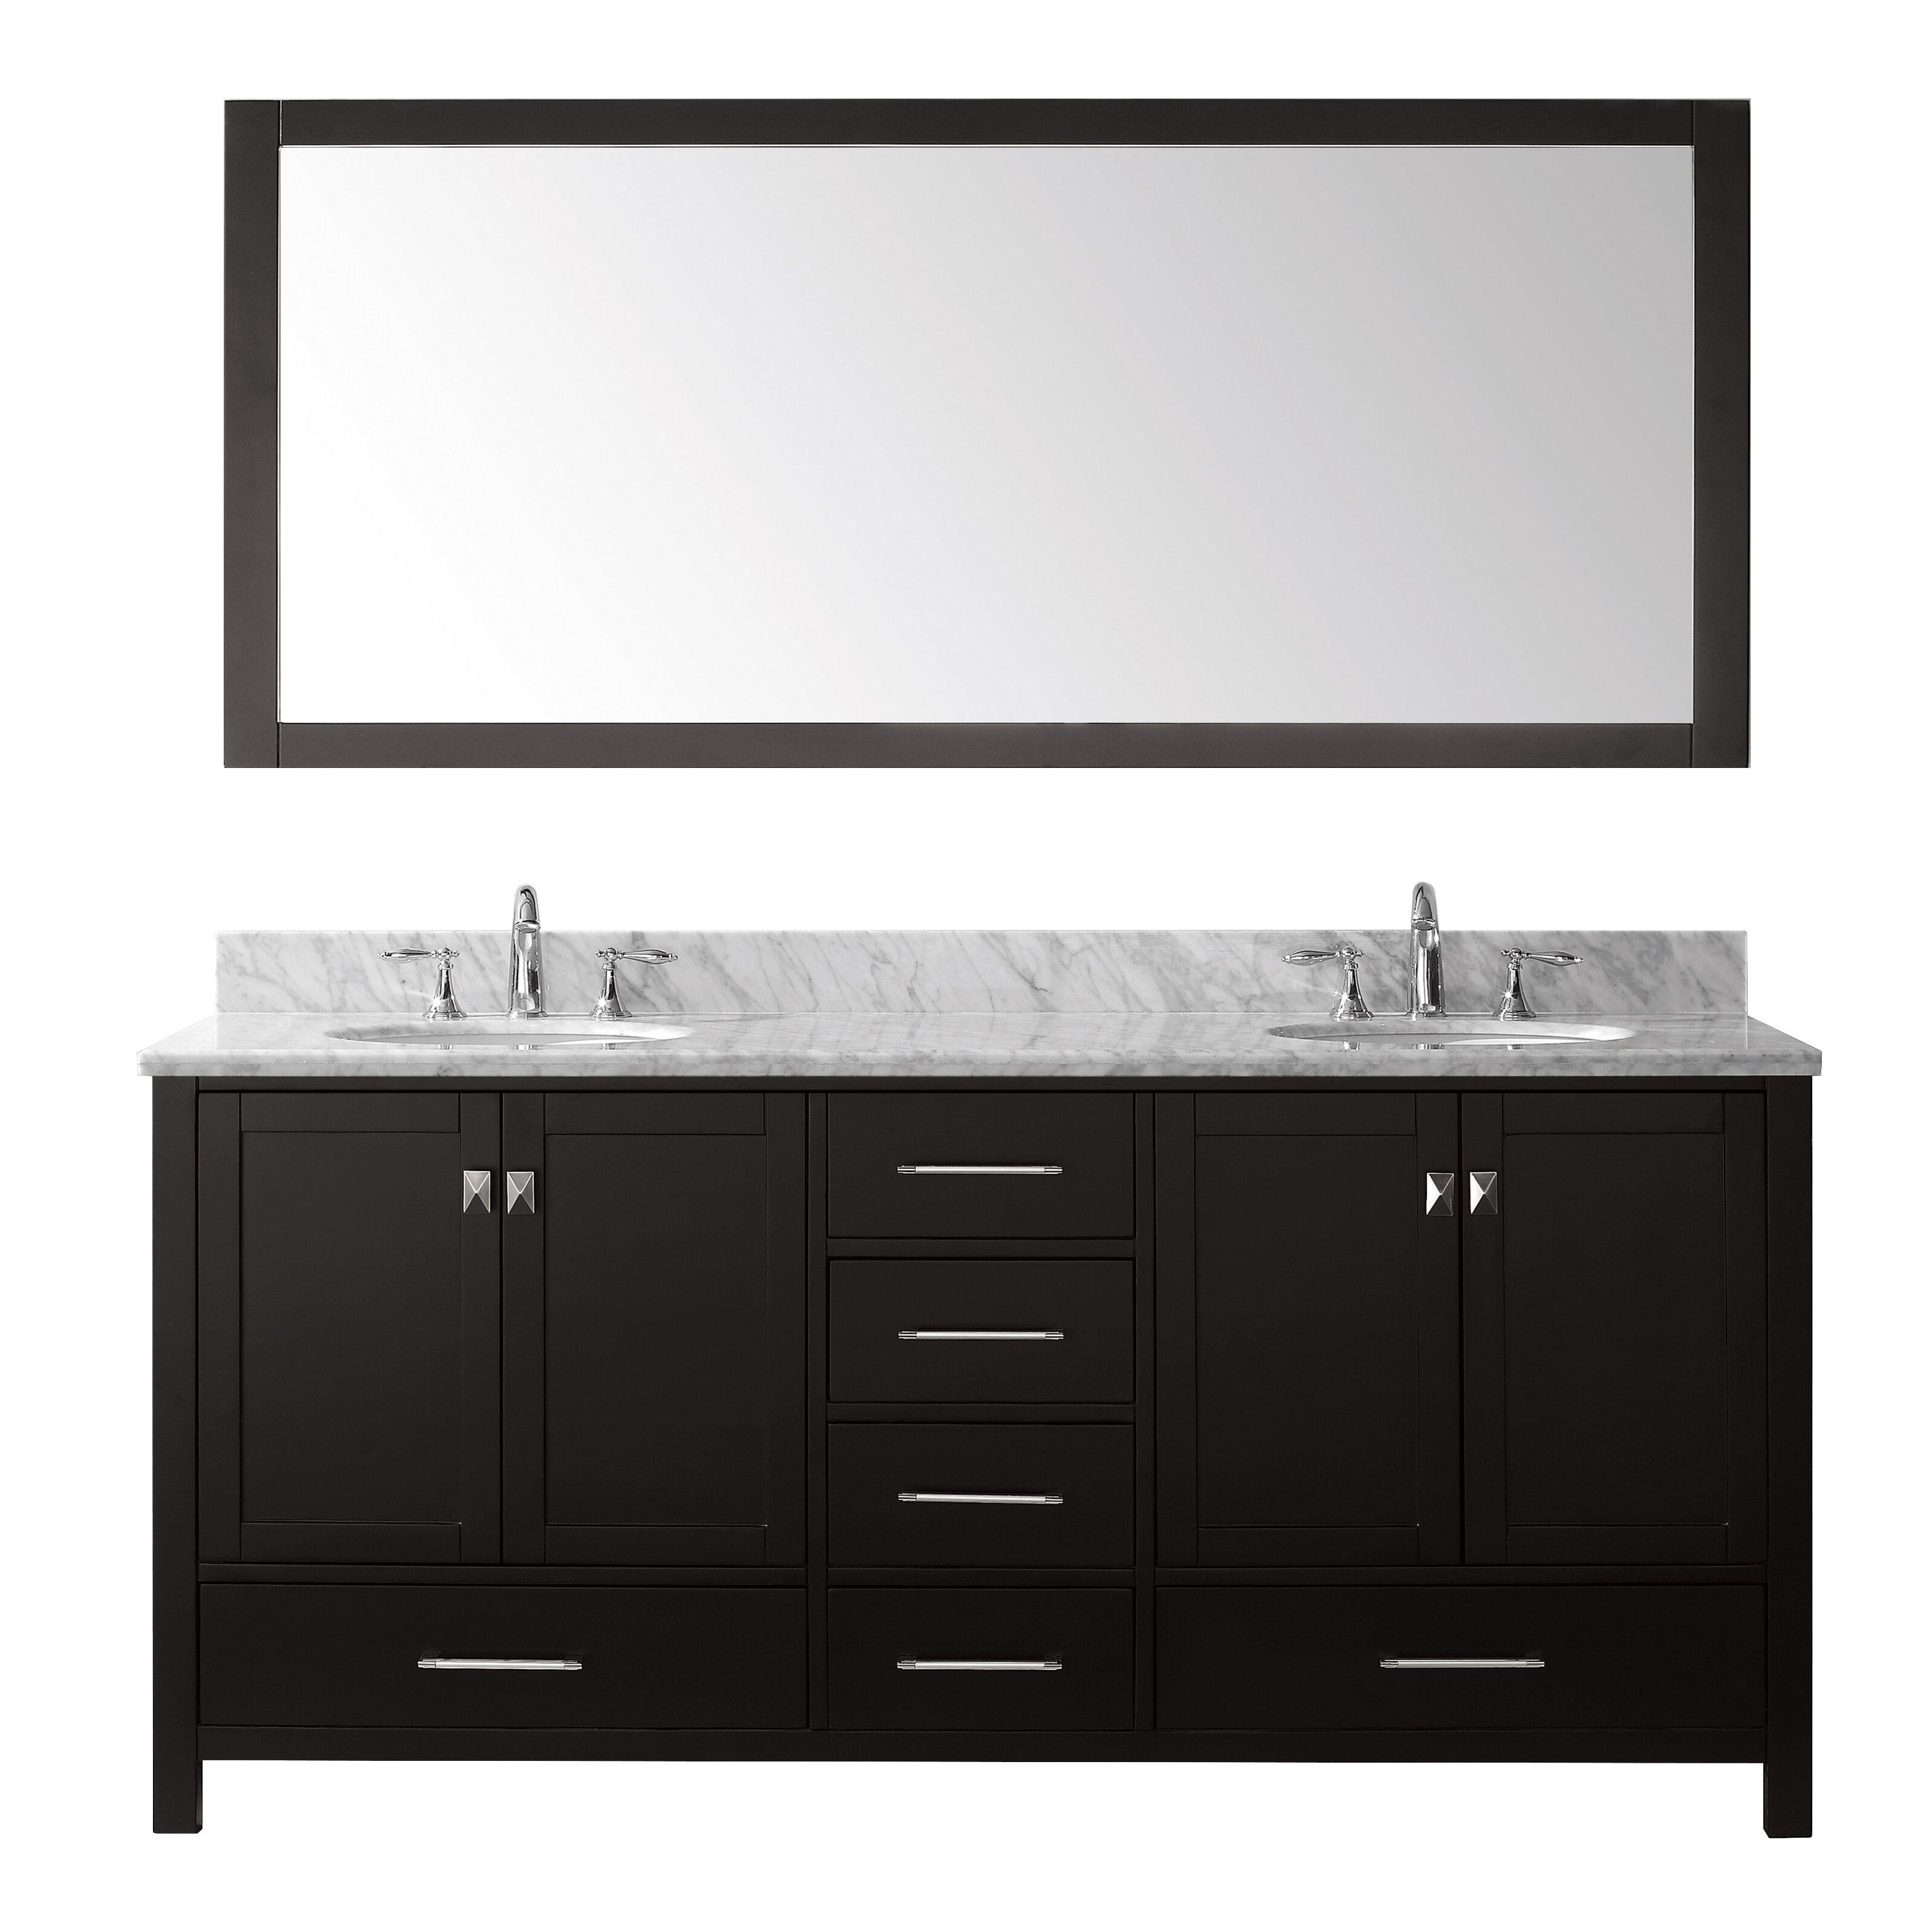 Custom Bathroom Vanities Rochester Ny bathroom vanities rochester ny | modelismo-hld